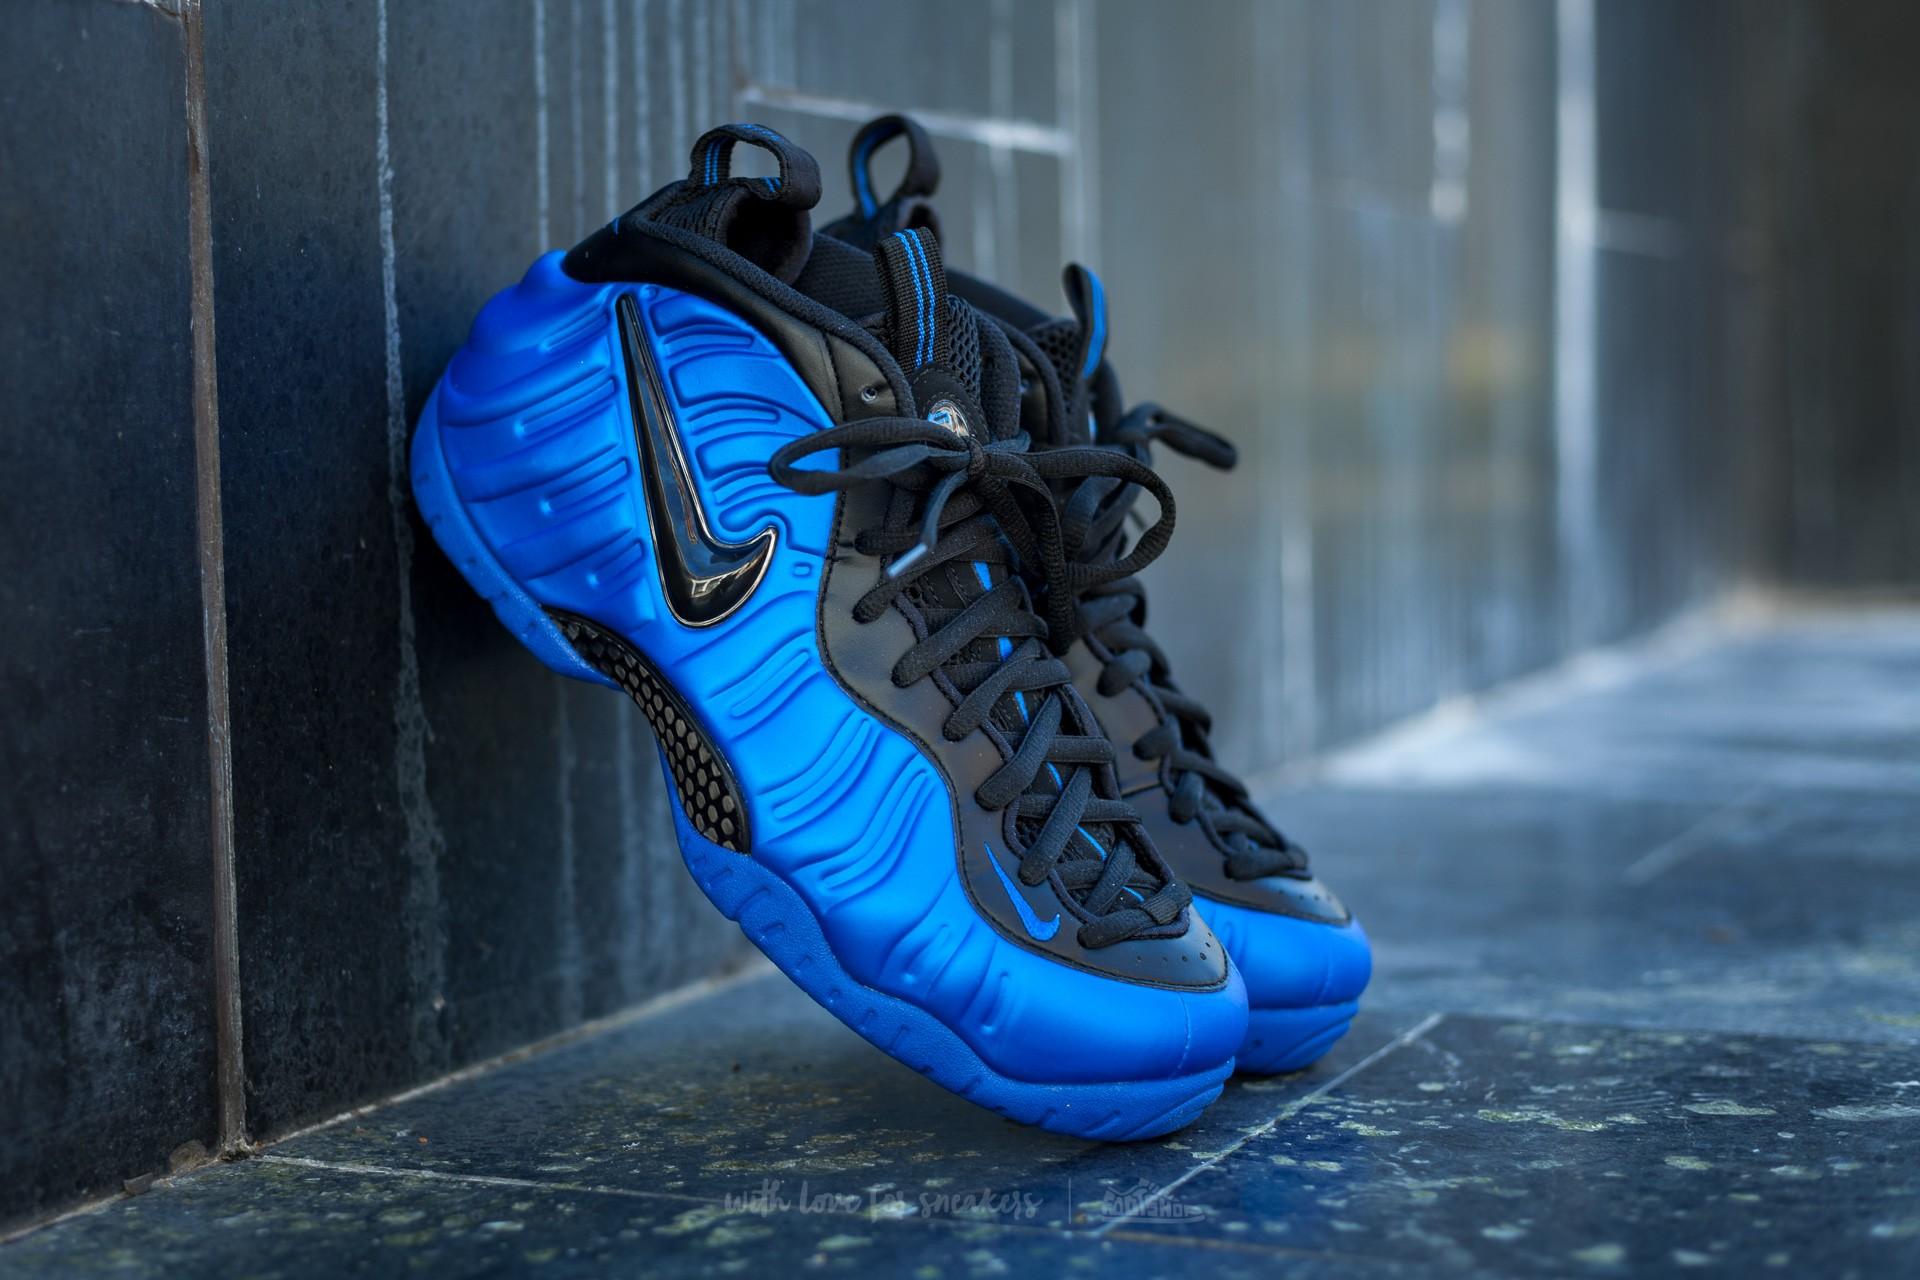 fcd8954489f Nike Air Foamposite Pro Hyper Cobalt  Black-Hyper Cobalt